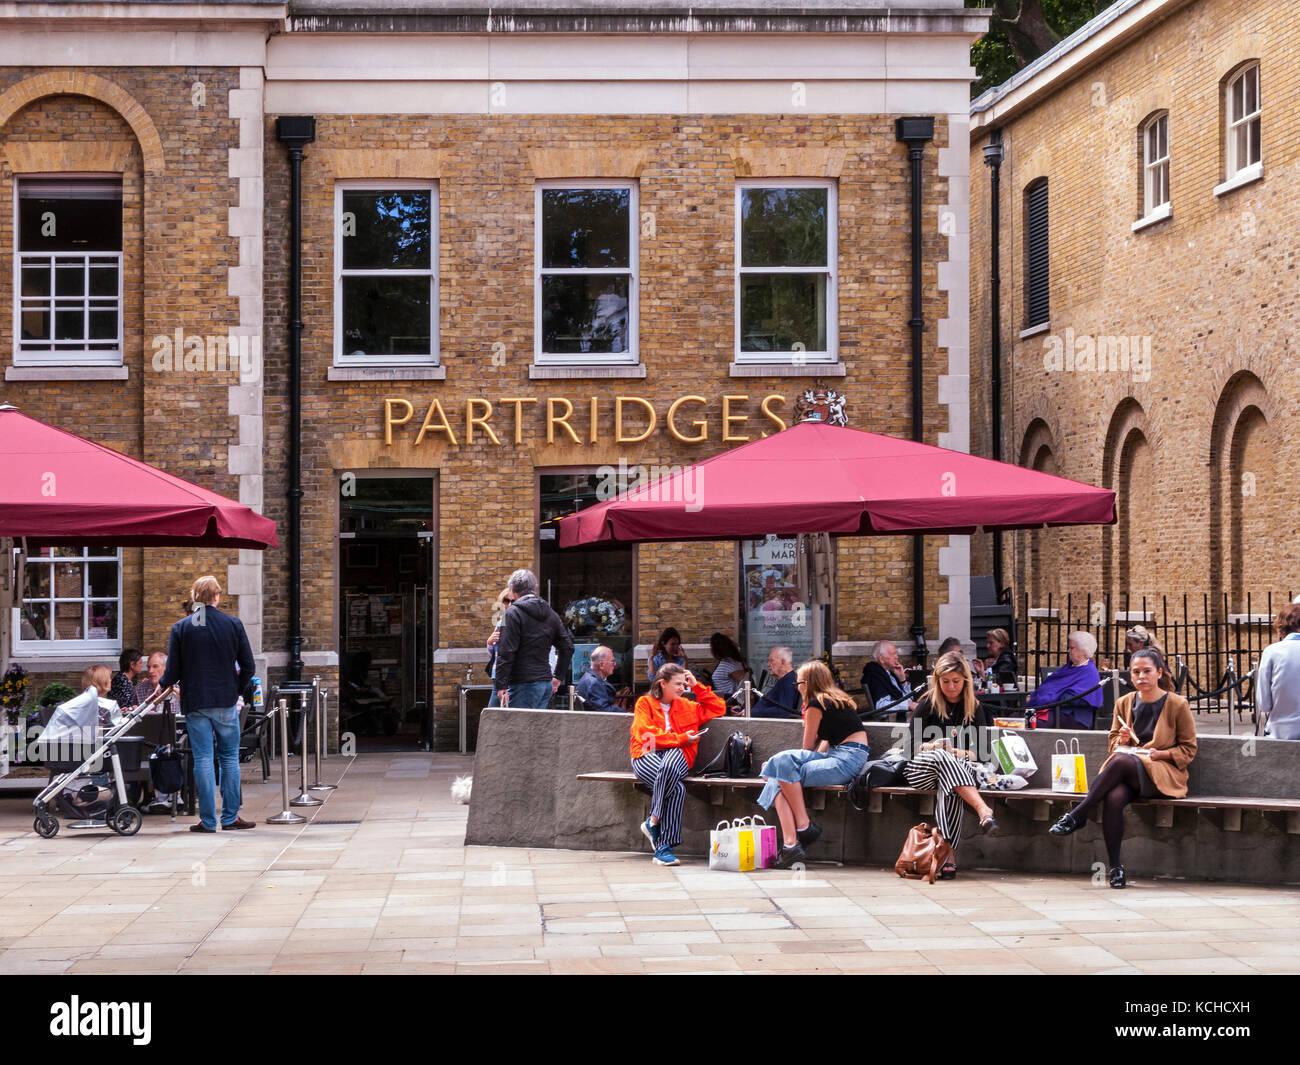 Partridges Food Shop, Duke of York Square, Kings Road, London - Stock Image